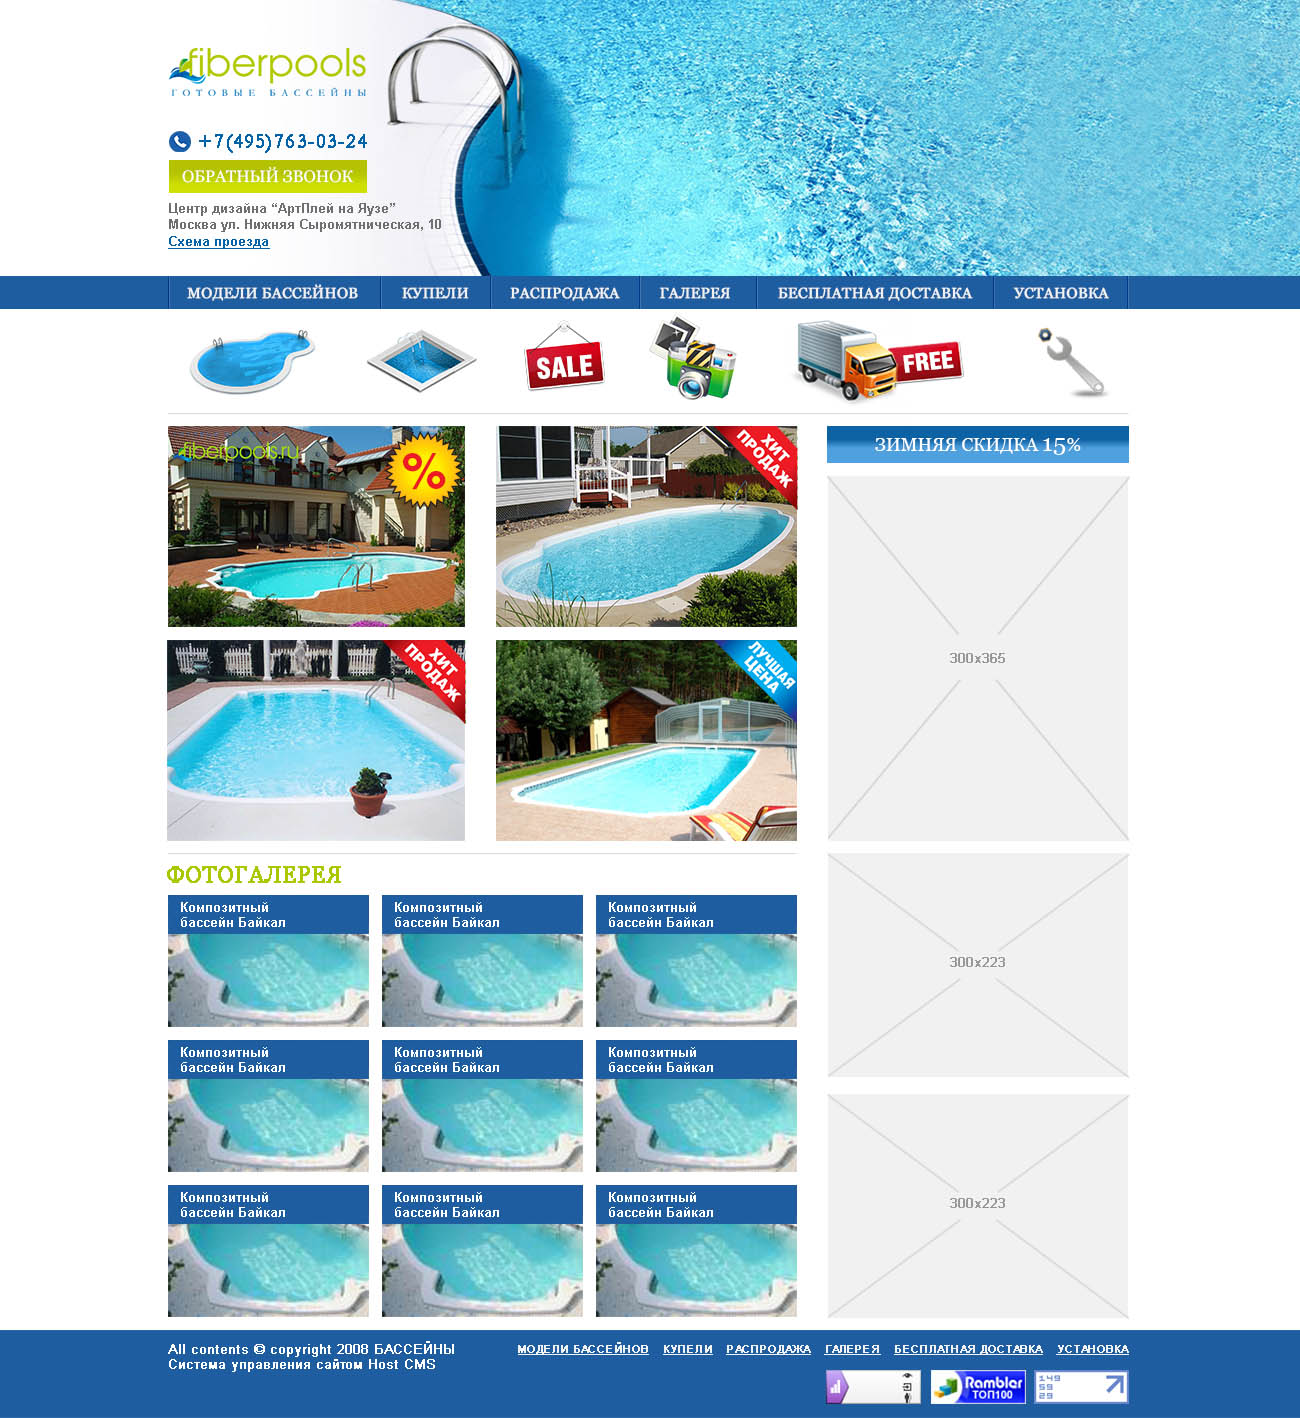 Разработка дизайна сайта и каталога бассейнов фото f_08754970dae5efbd.jpg